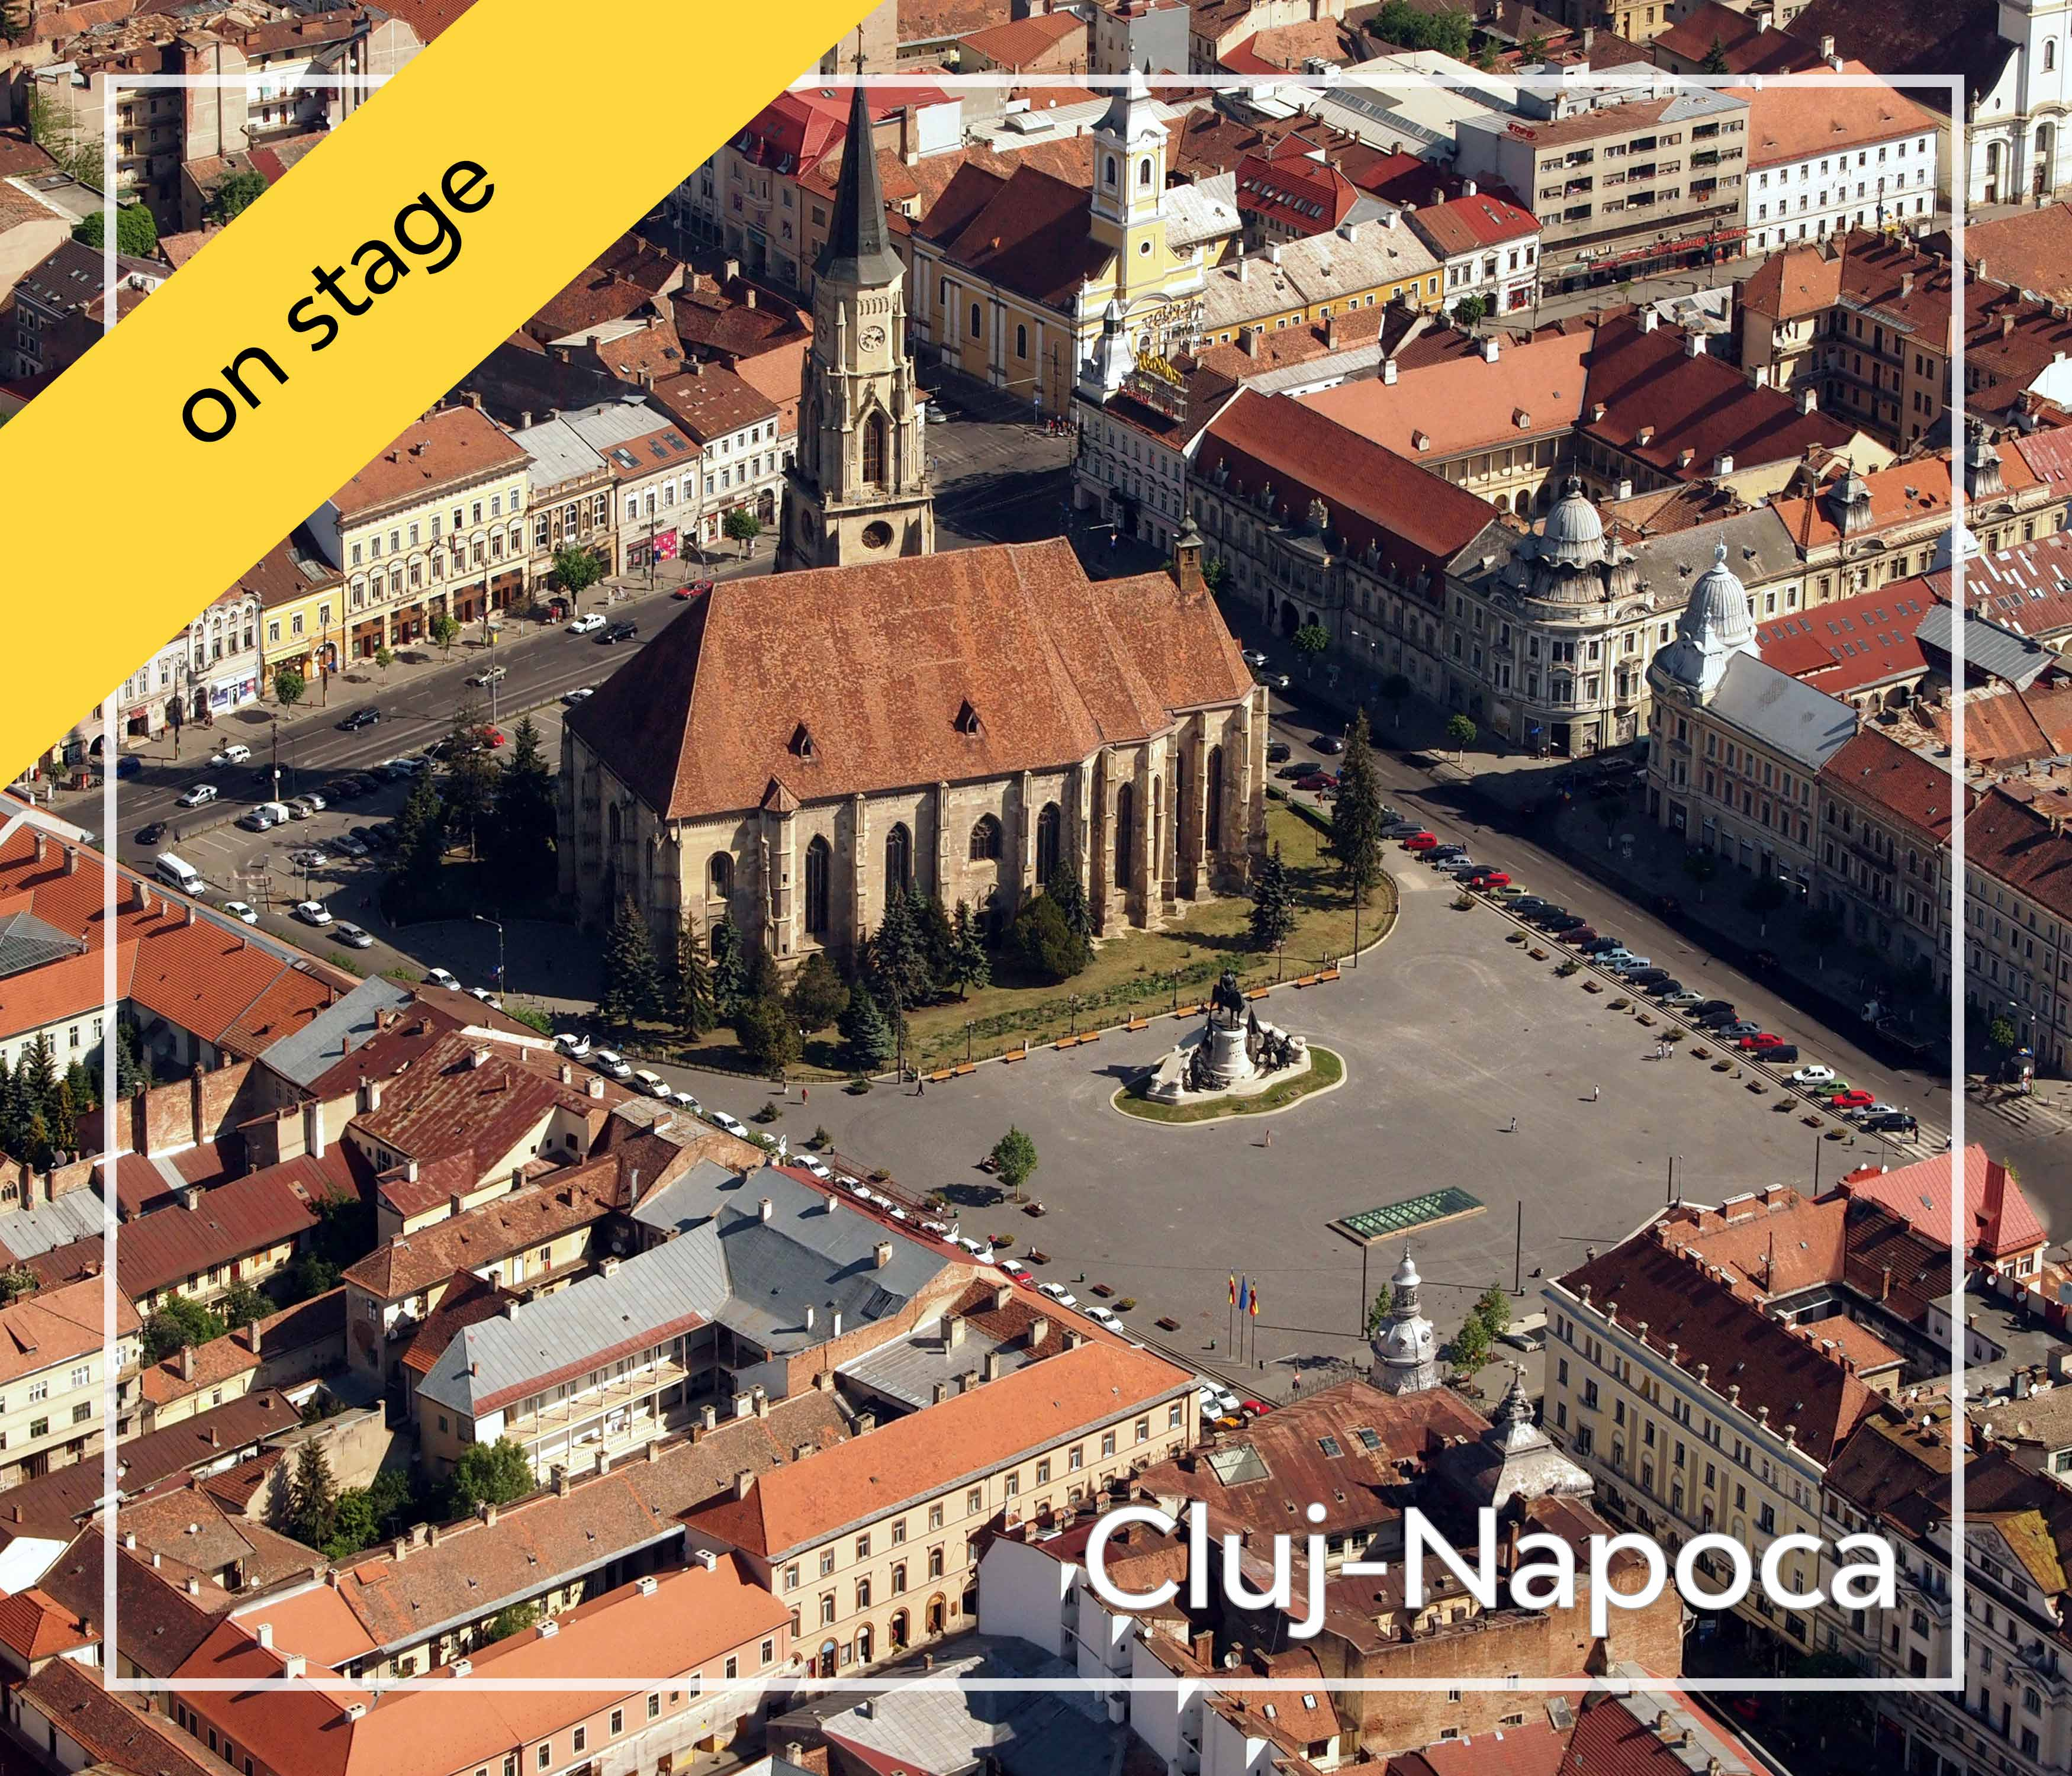 On-stage—Cluj-Napoca